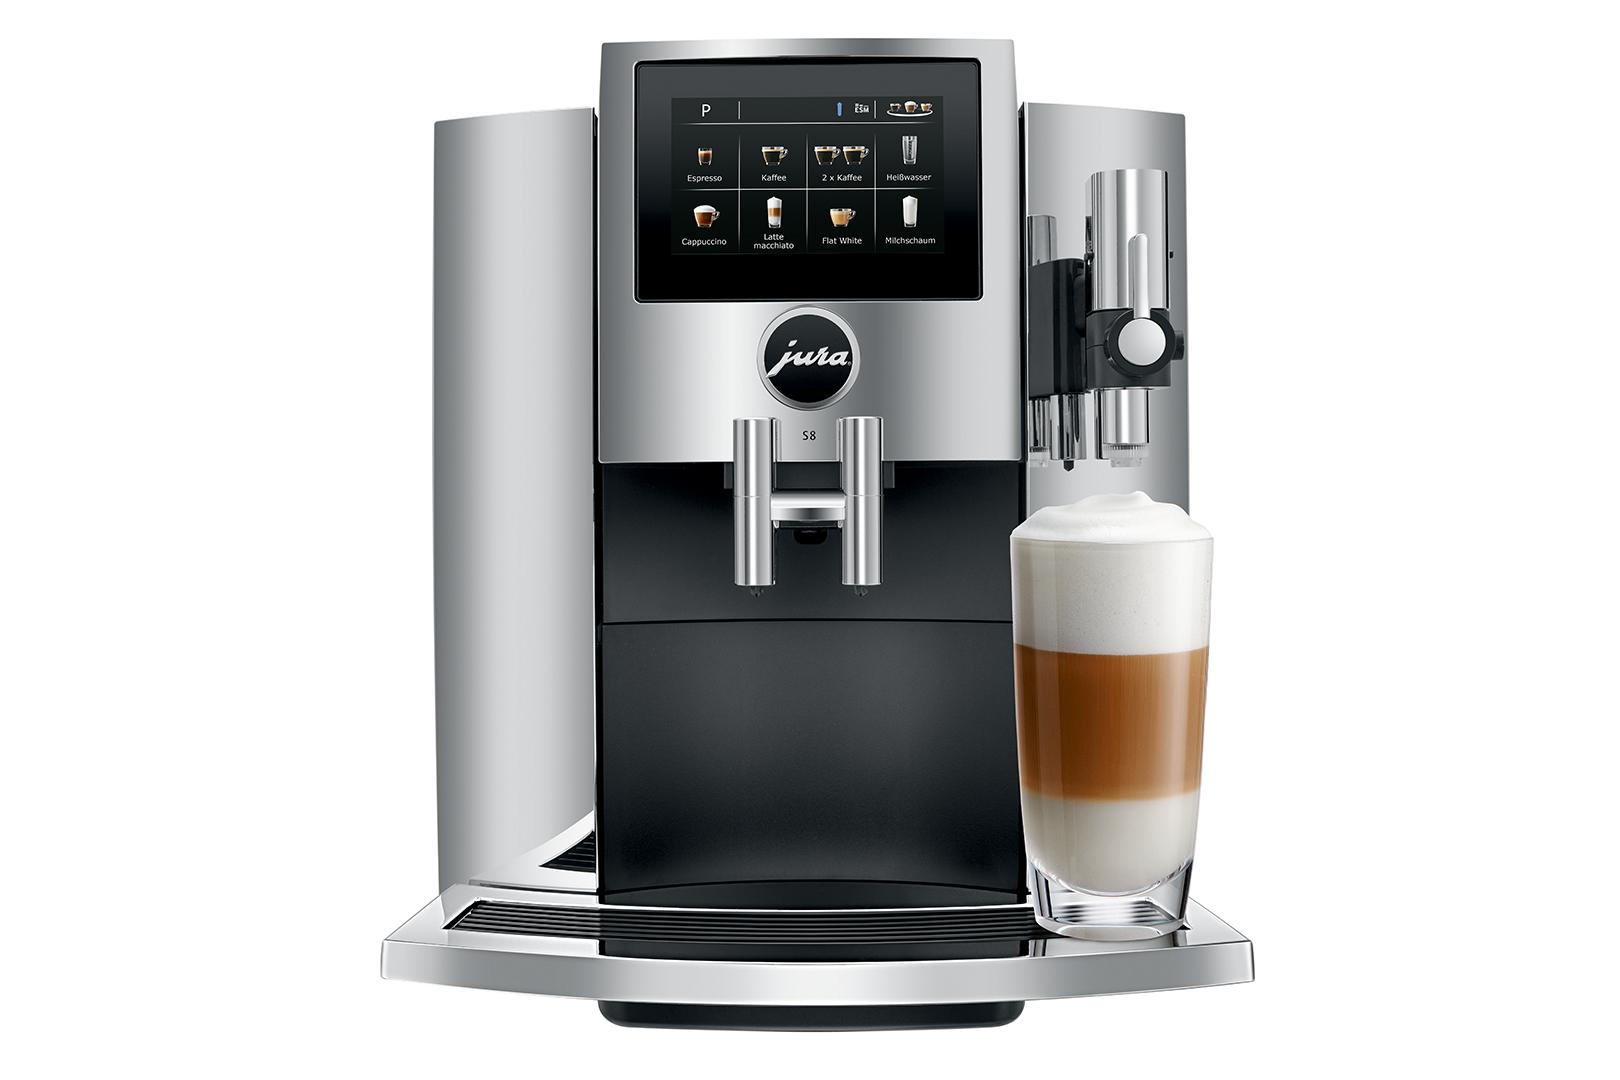 Carolina Coffee Jura S8 Chrome